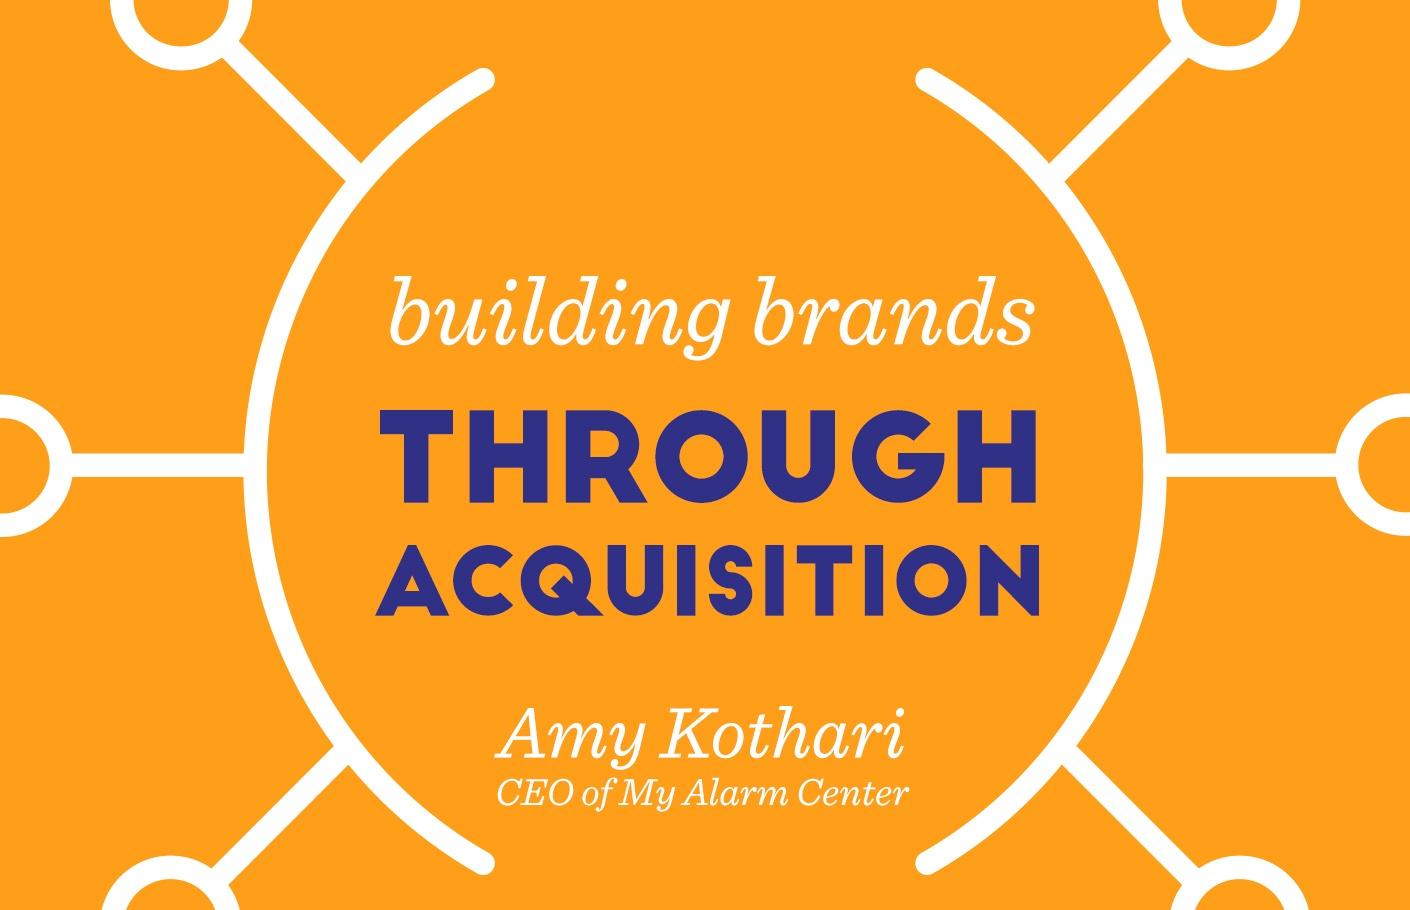 Building Brands Through Acquisition - Amy Kothari, My Alarm Center